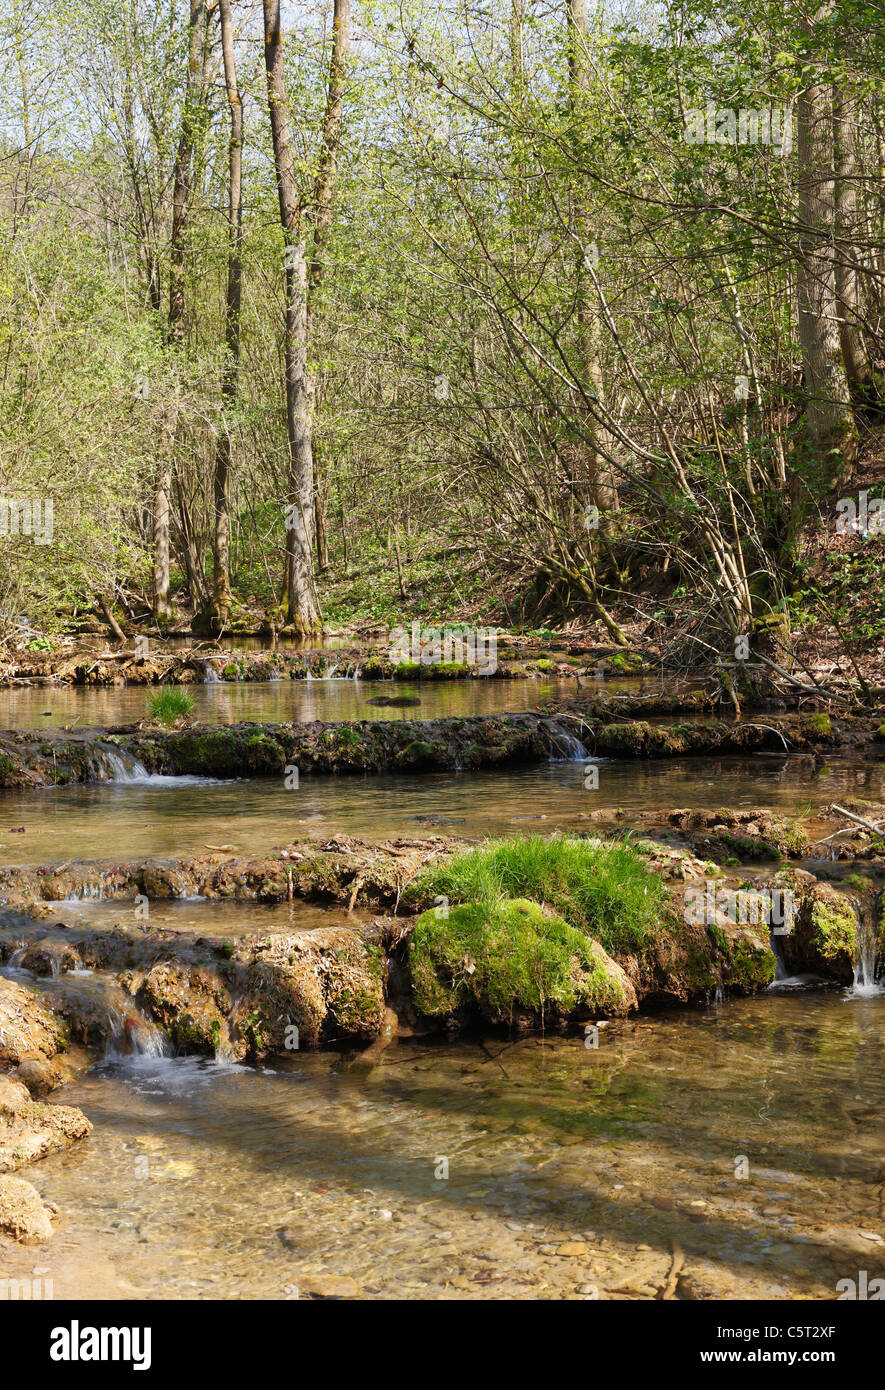 Germany, Bavaria, Franconia, Upper Franconia, Franconian Switzerland, Weissenohe, Lillach Valley, Stream at sinter - Stock Image